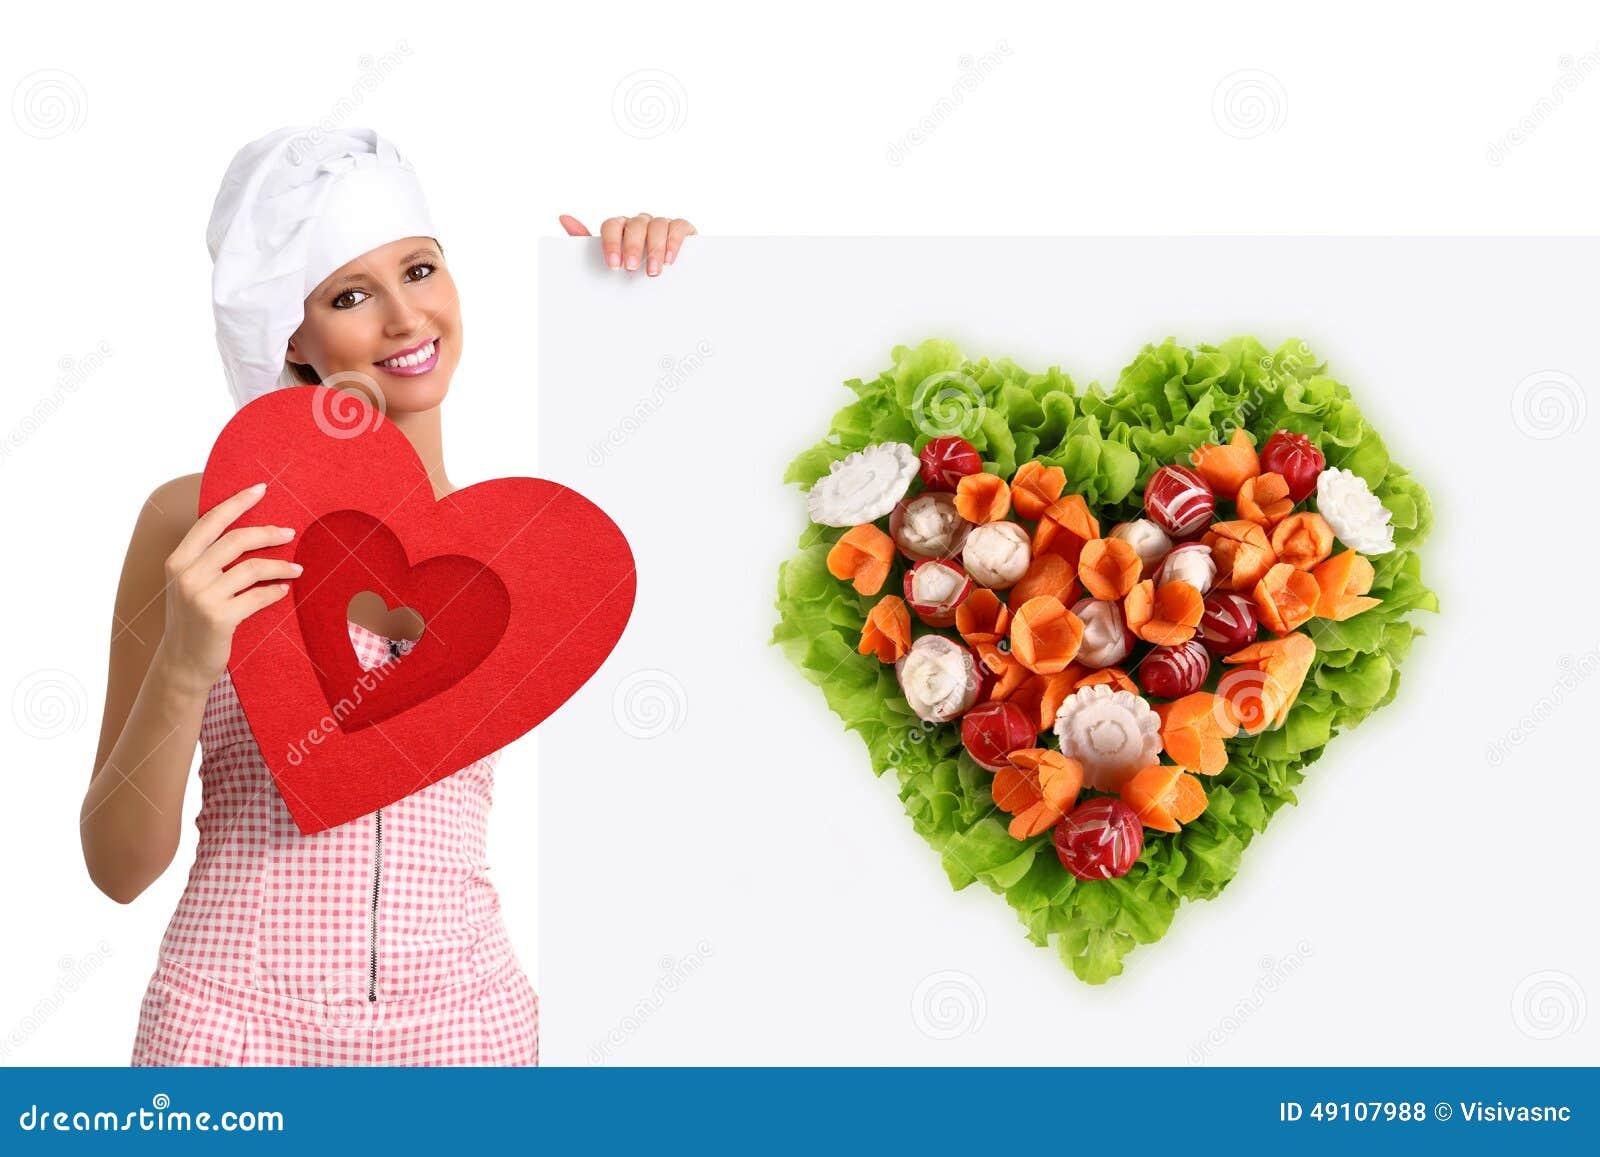 Concept vegetarian diet chef woman pointing billboard salad heart shape